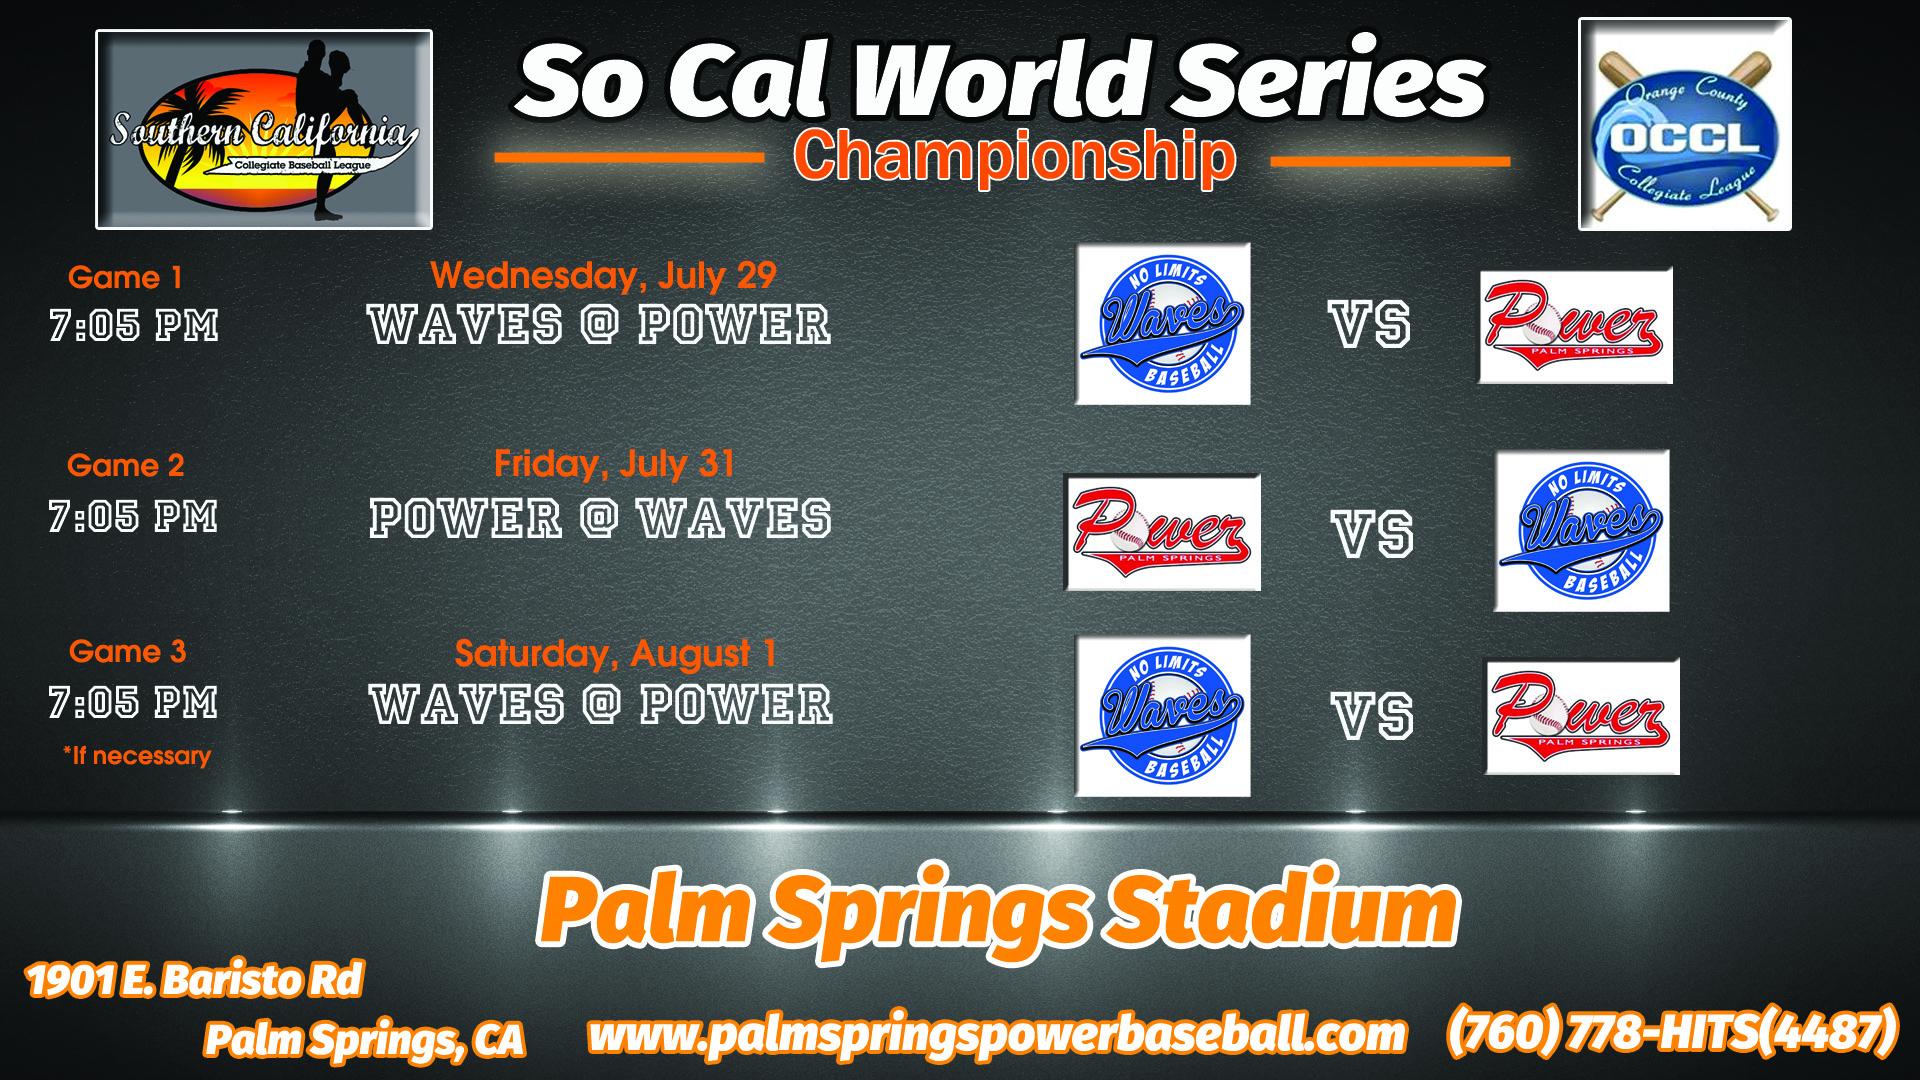 So Cal World Series